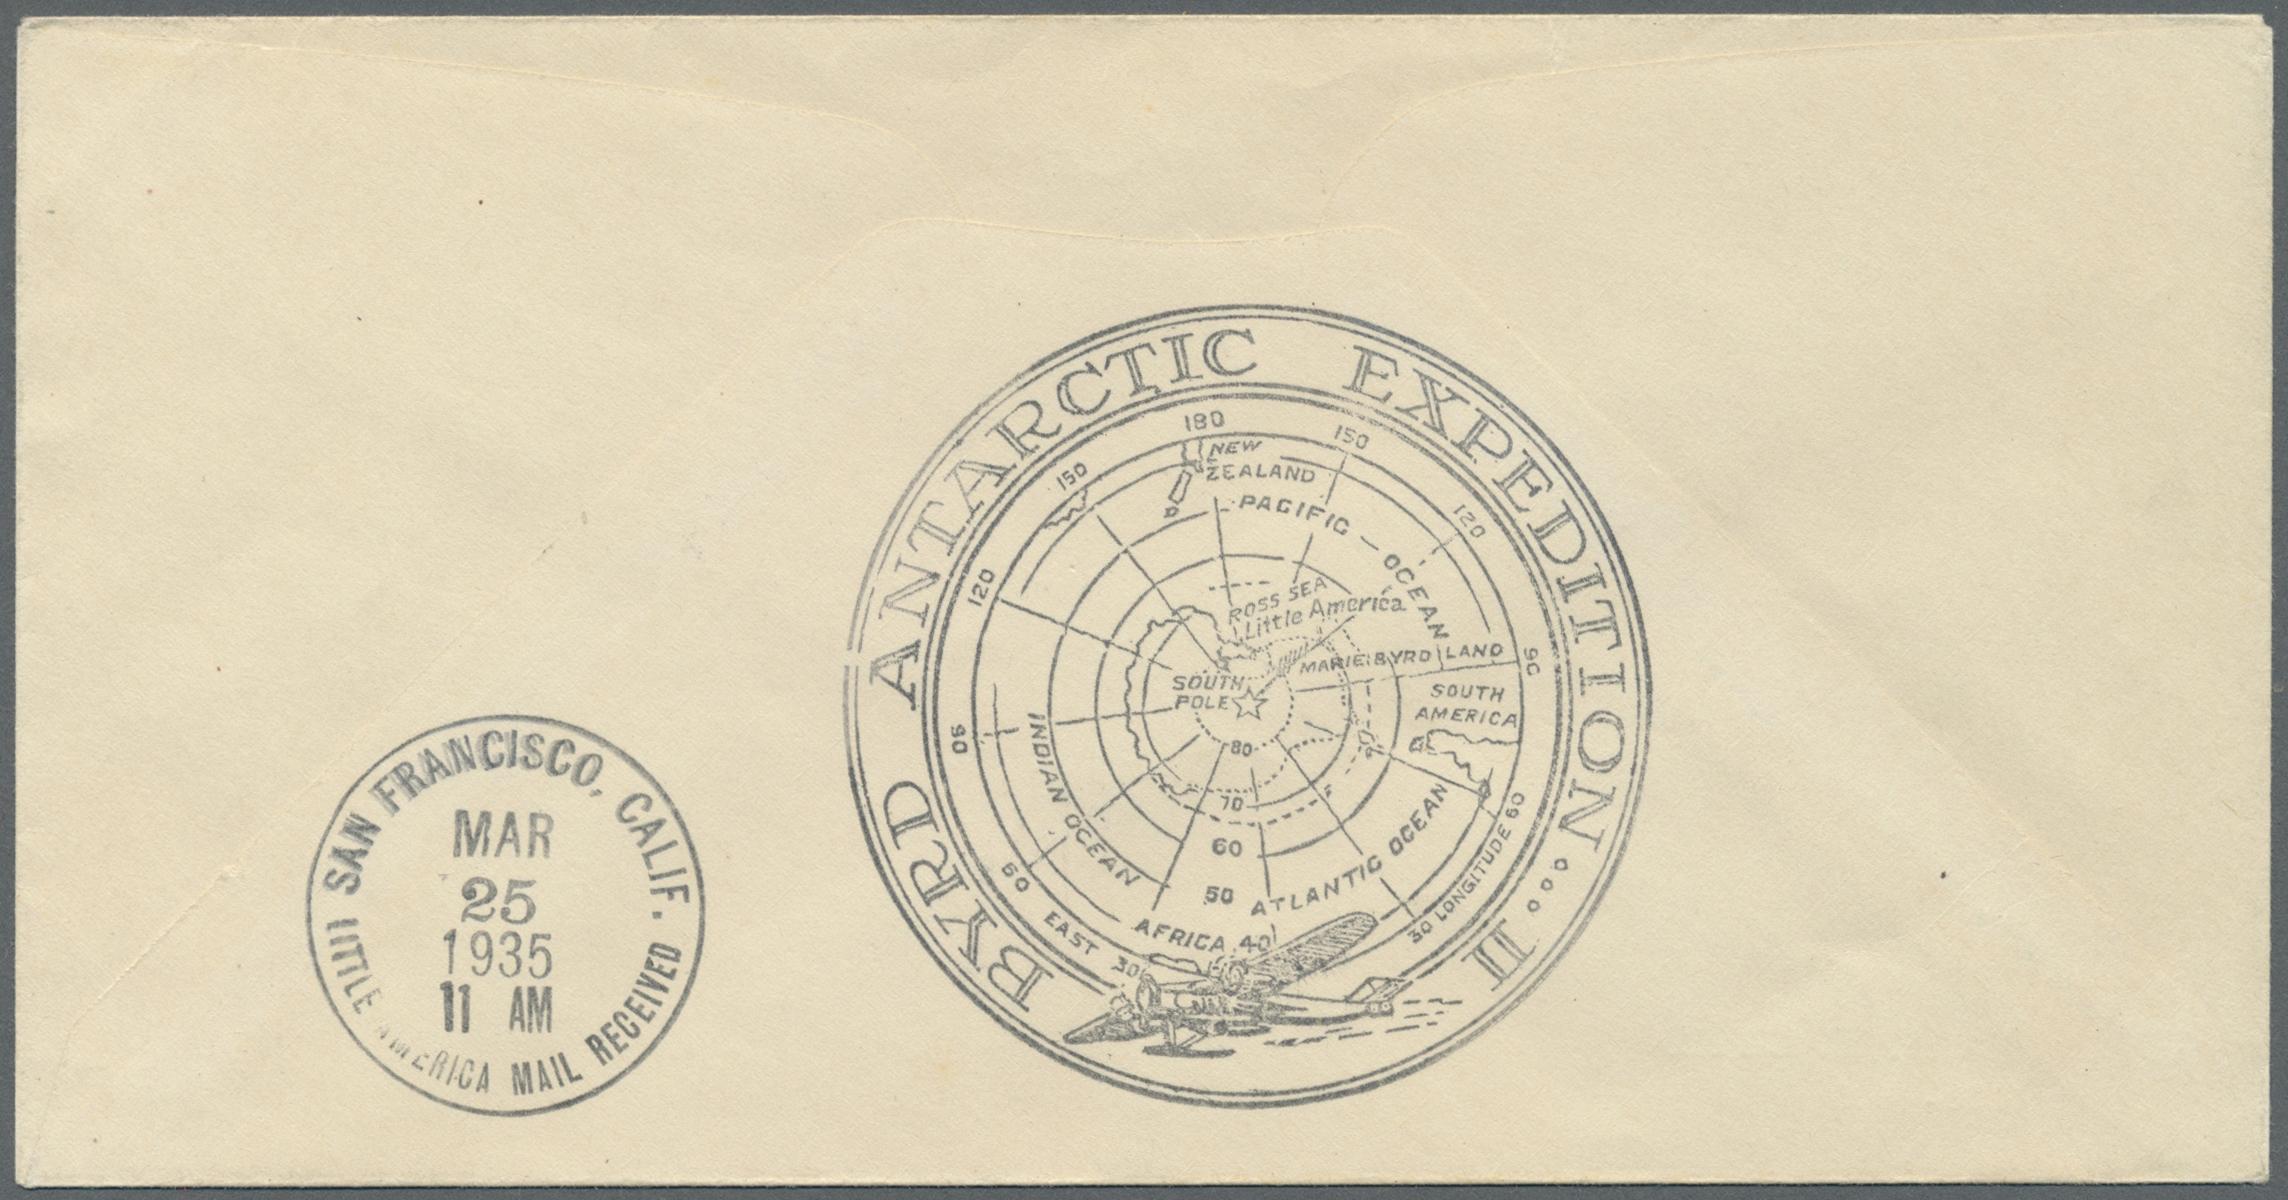 Lot 11018 - thematik: antarktis / antarctic  -  Auktionshaus Christoph Gärtner GmbH & Co. KG Single lots Philately Overseas & Europe. Auction #39 Day 4